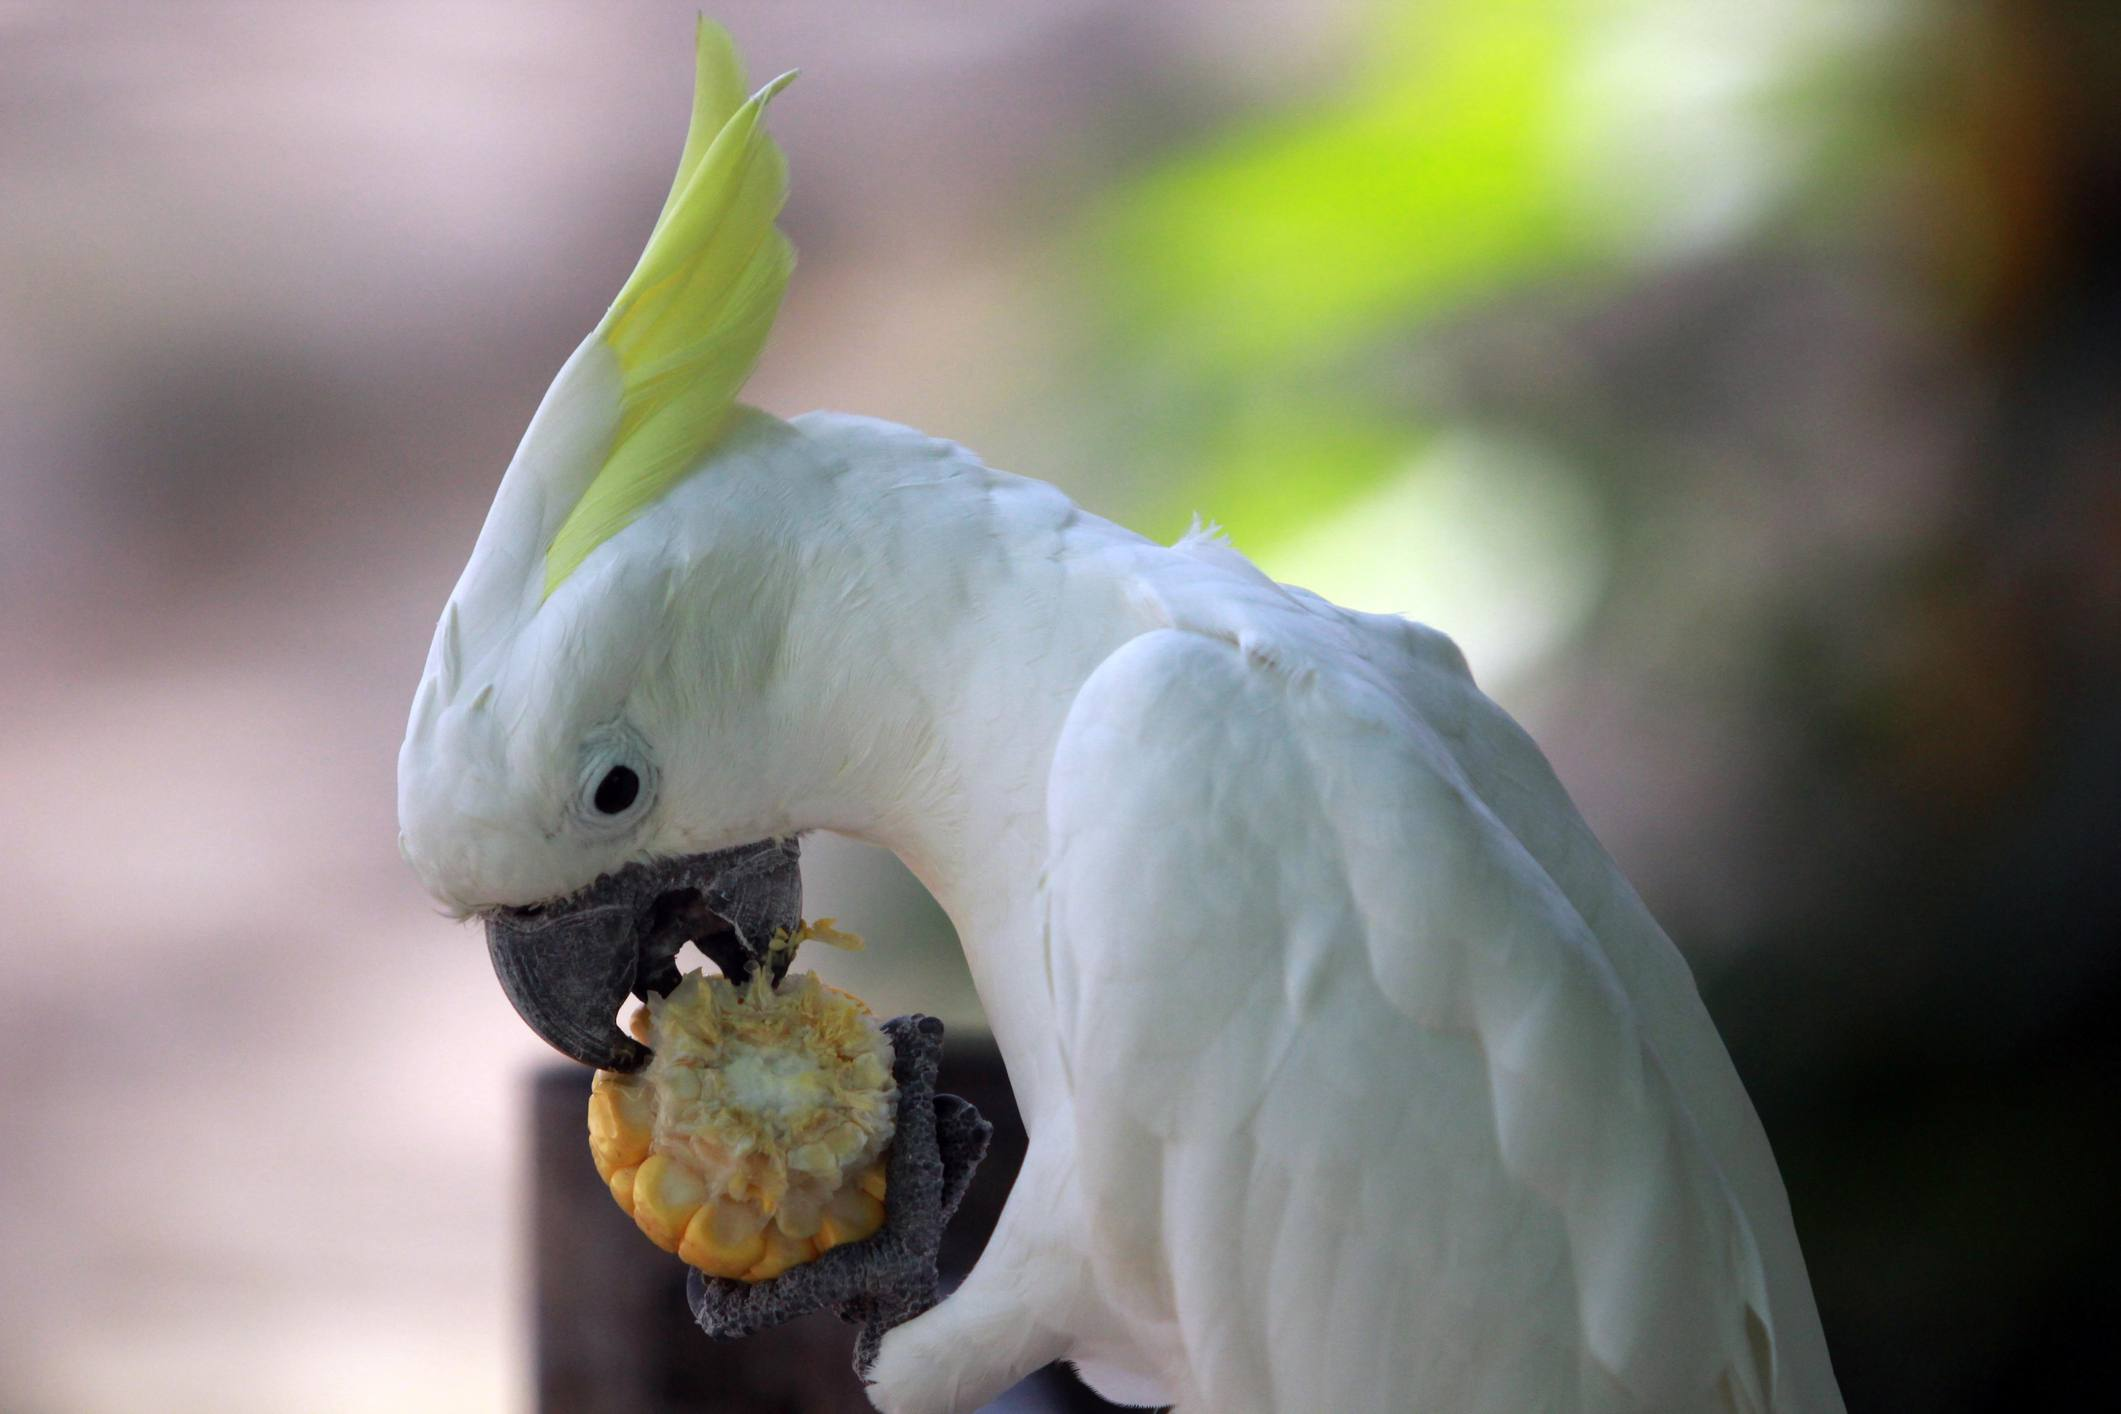 Cockatoo eating corn on a cob